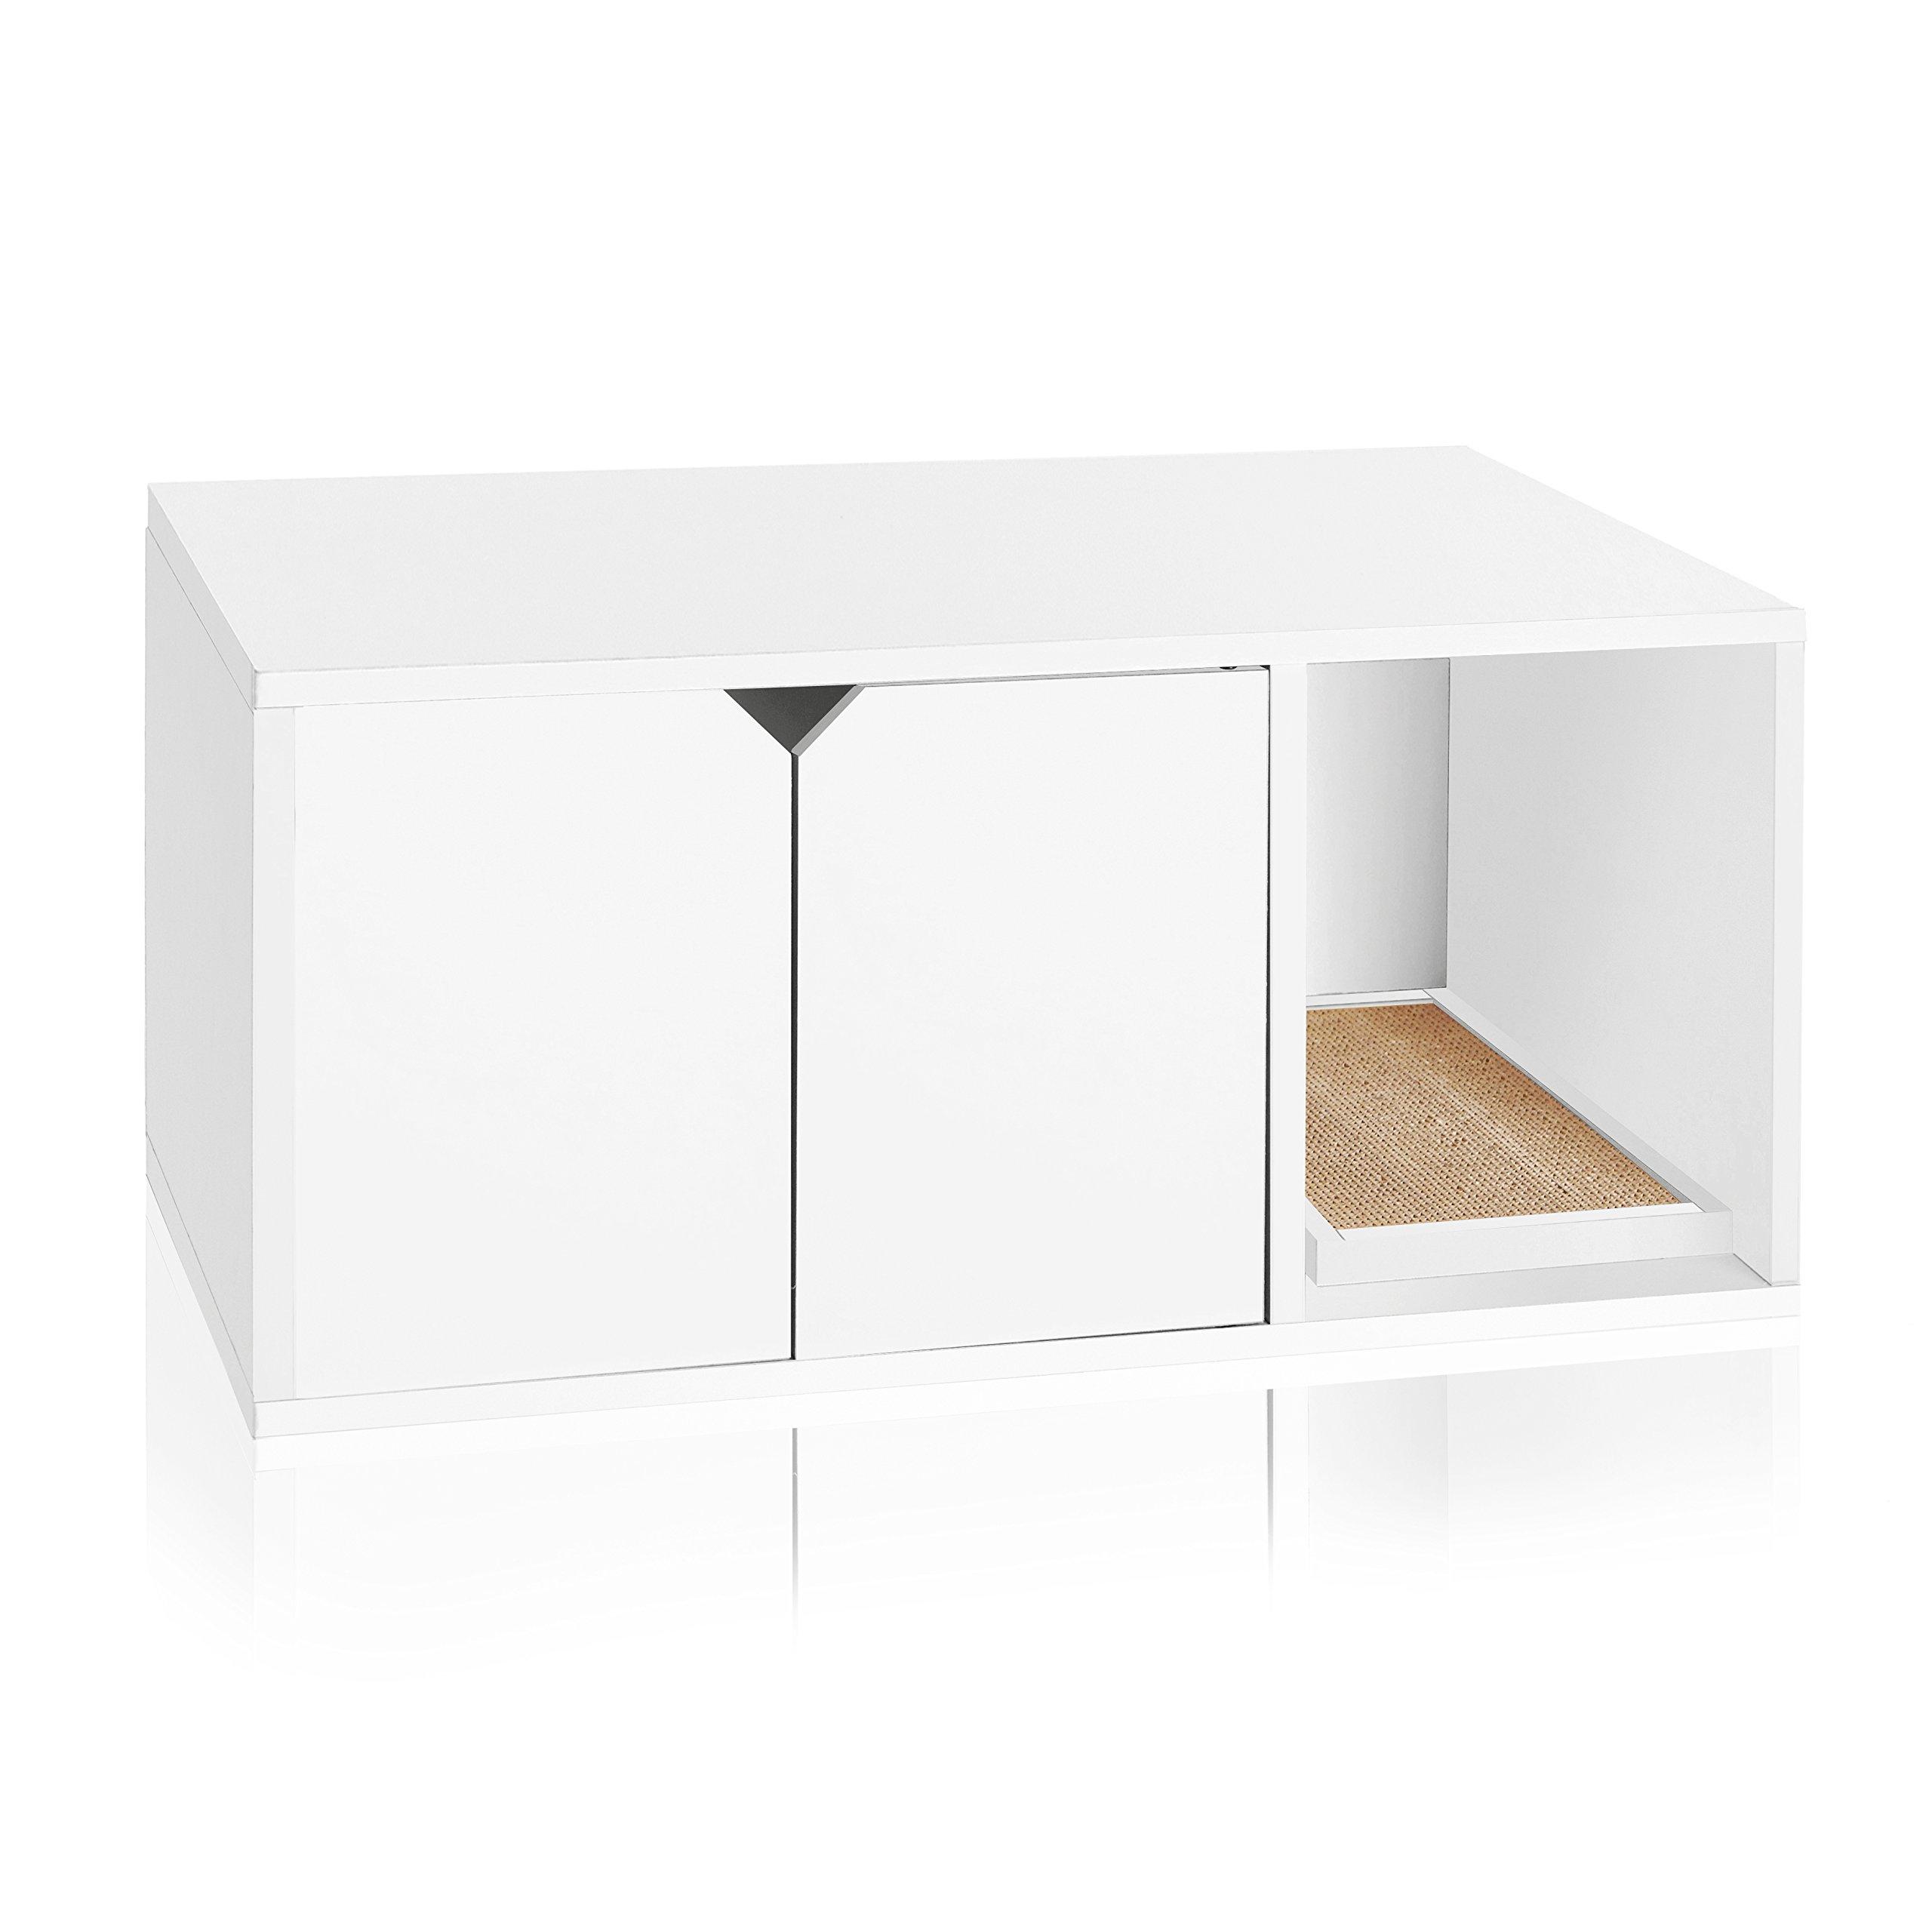 Way Basics PET-LITTER-WE Cat Litter Box, White